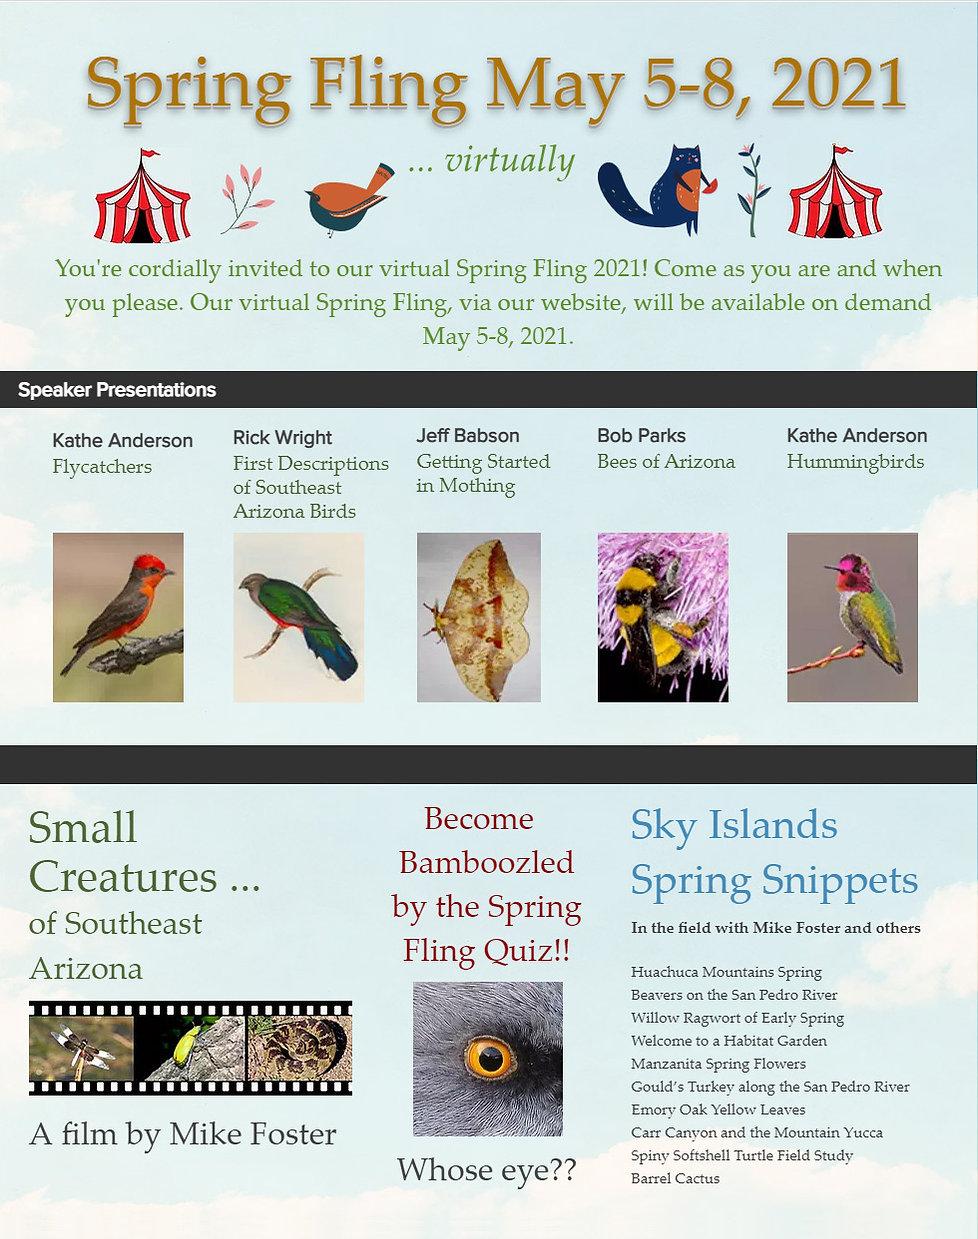 Spring-Fling-page.jpg